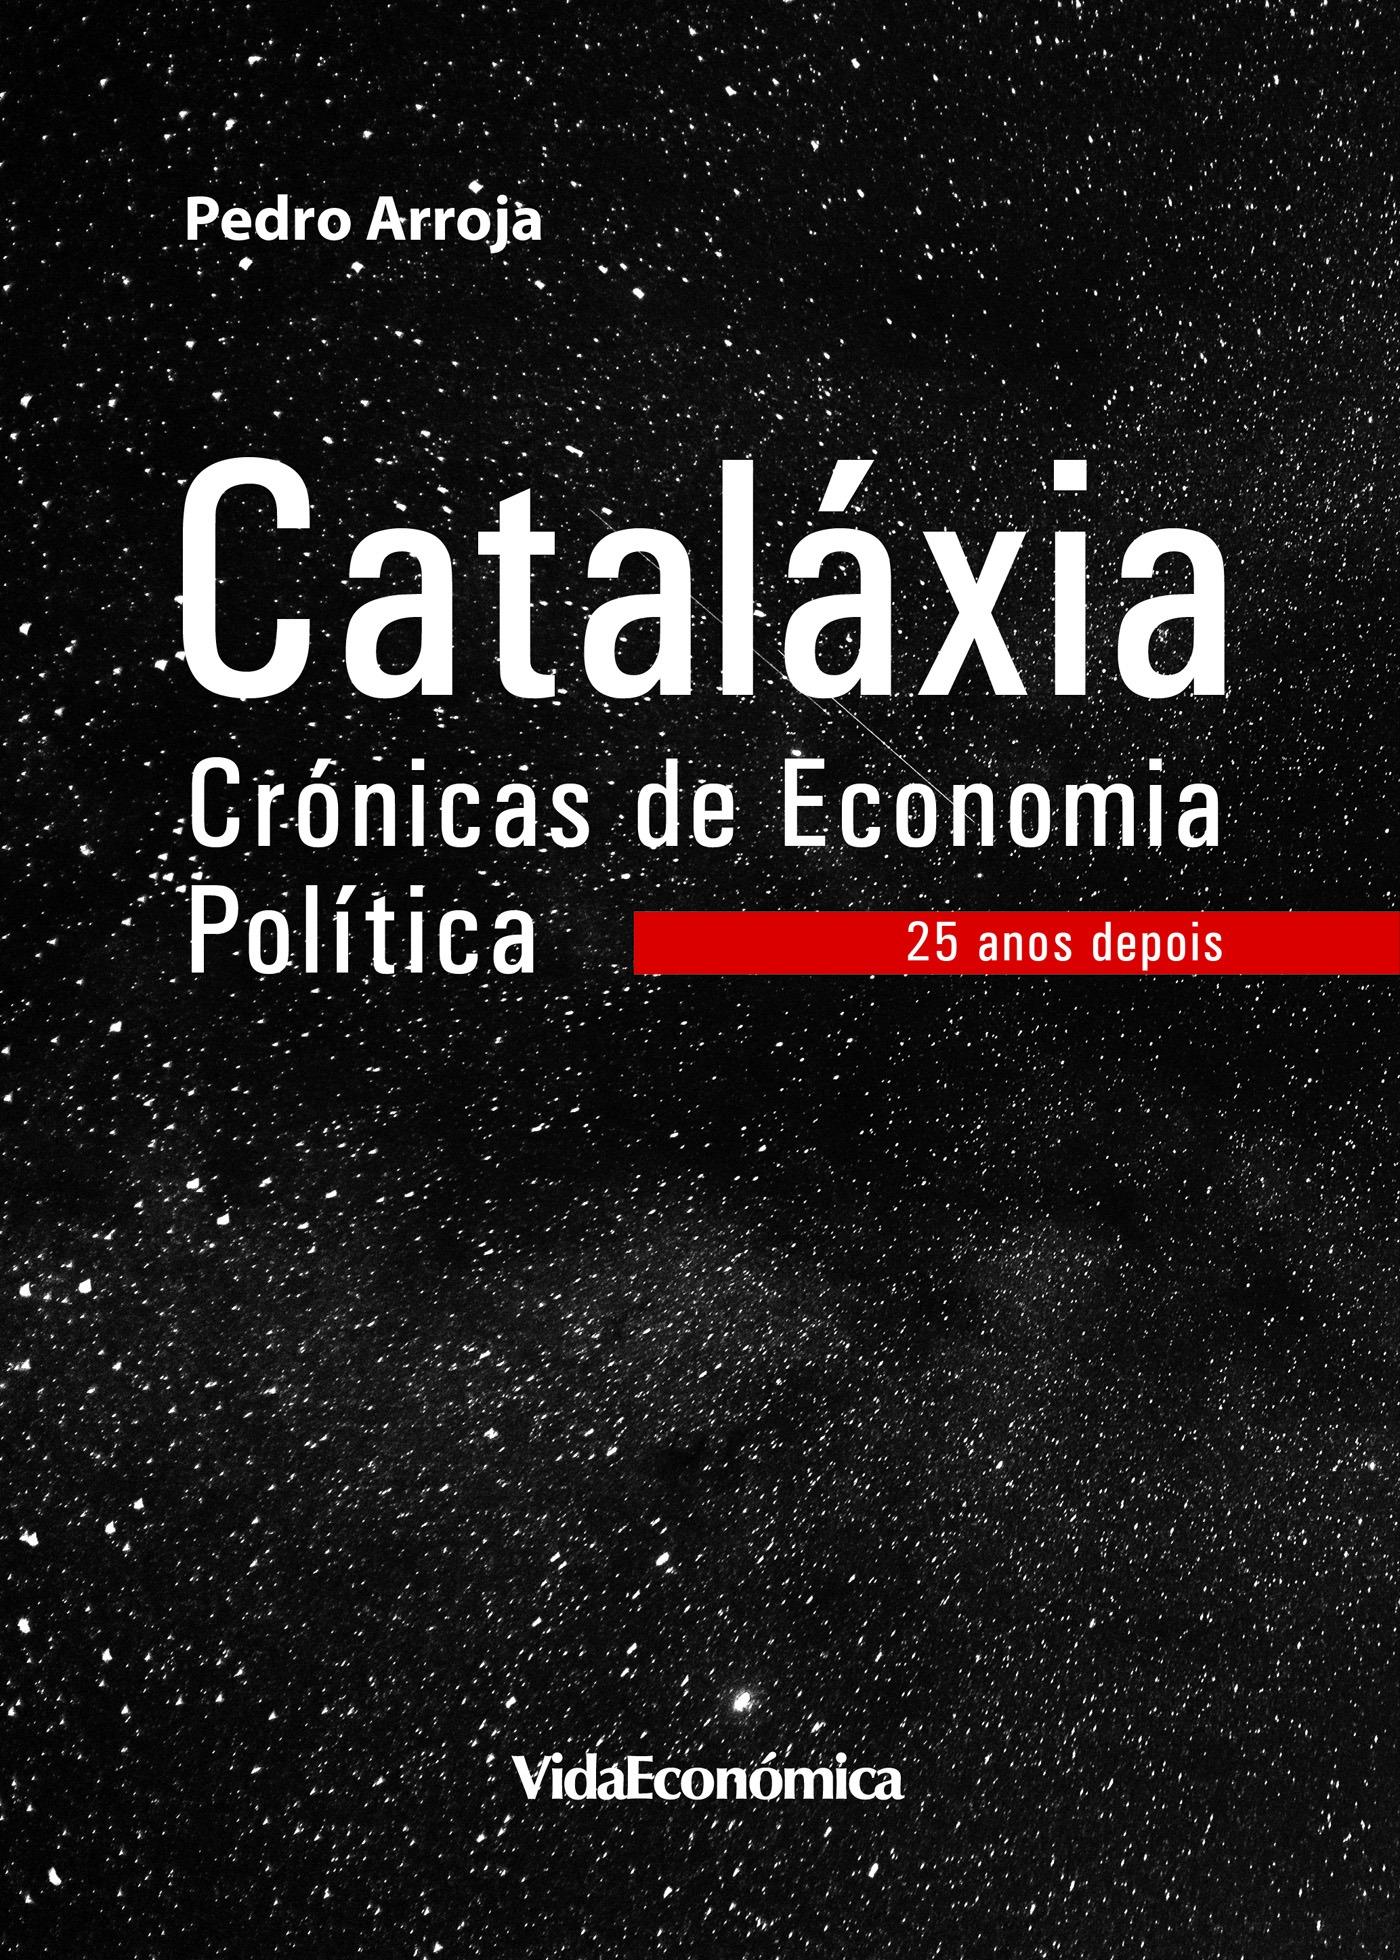 Cataláxia - Crónicas de Economia Política